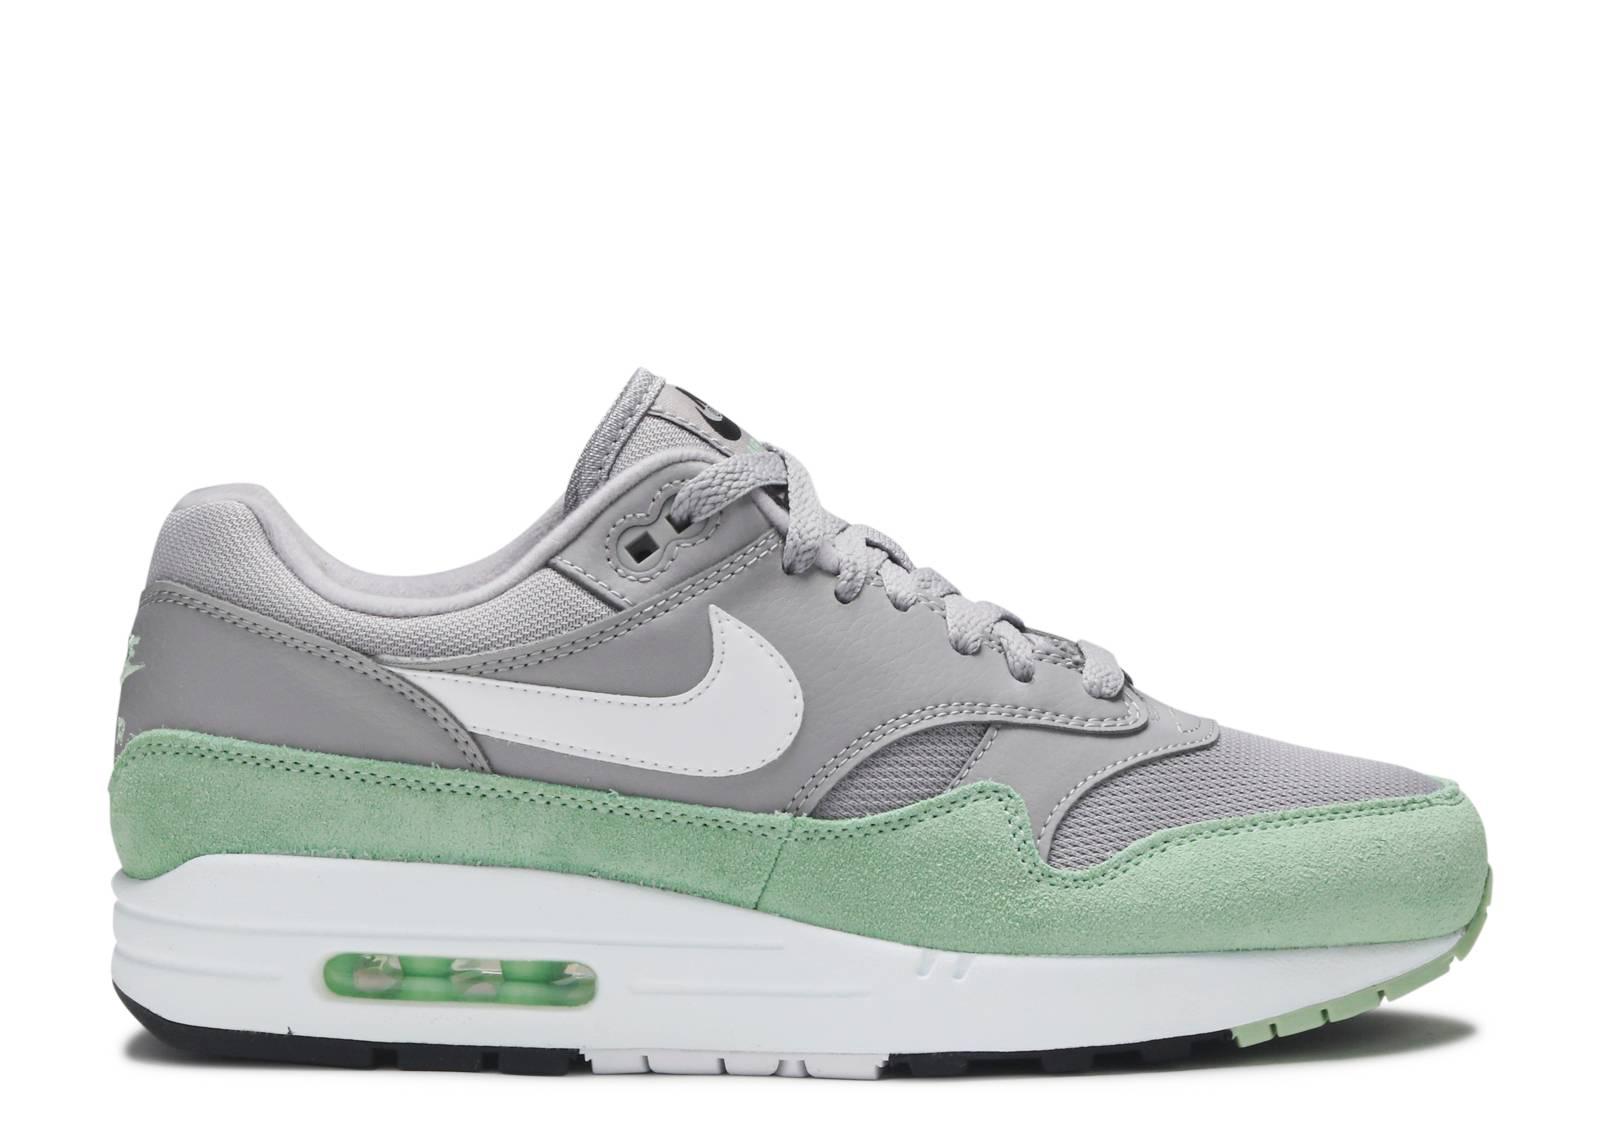 Air Max 1 'Grey Mint'